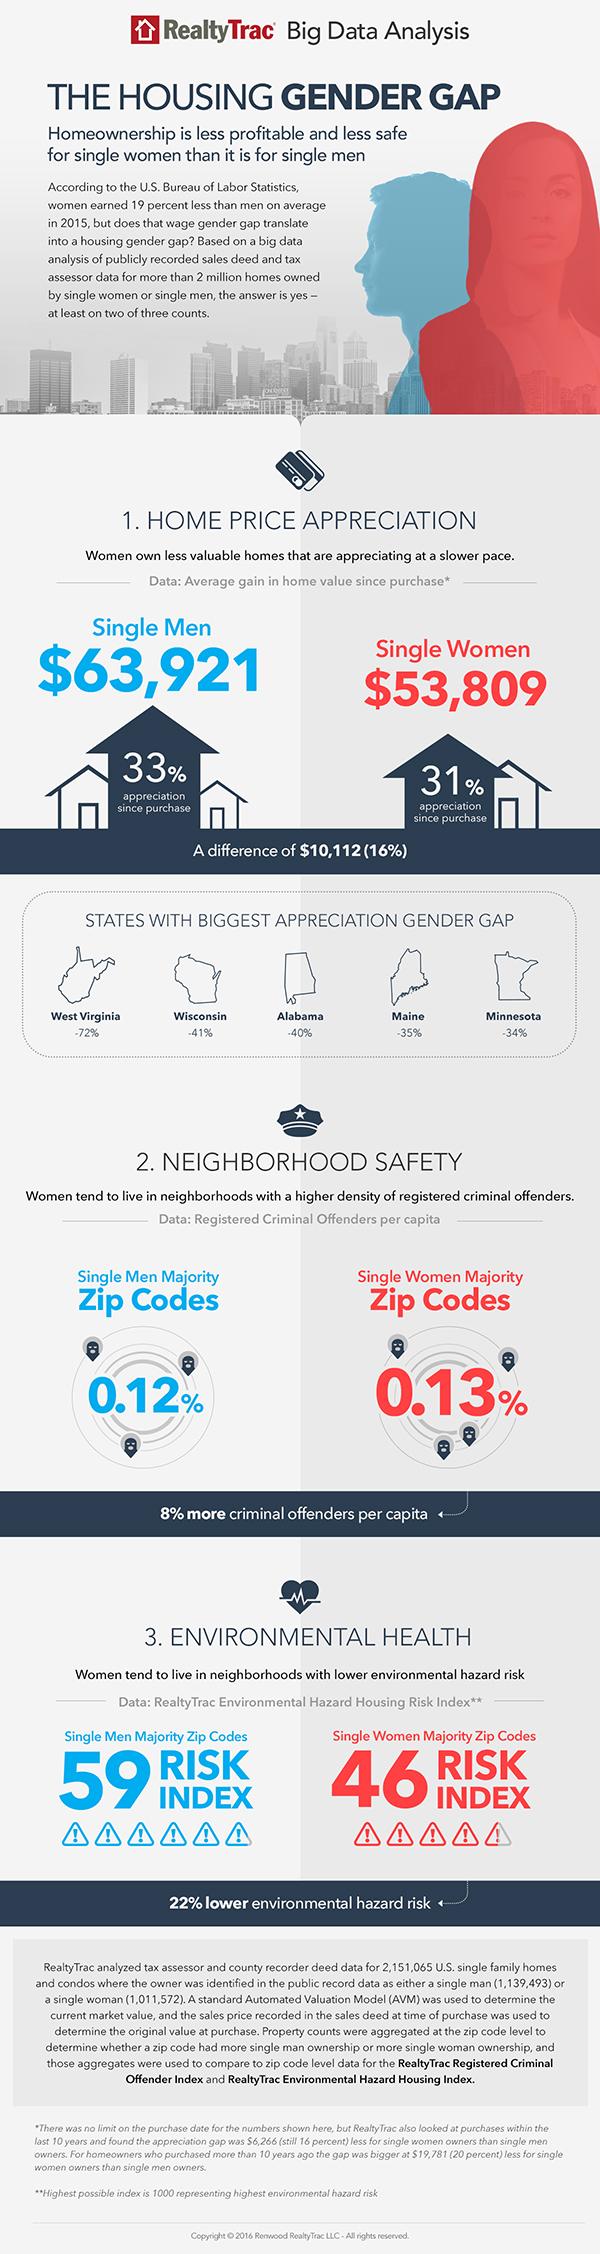 gender_gap_infographic